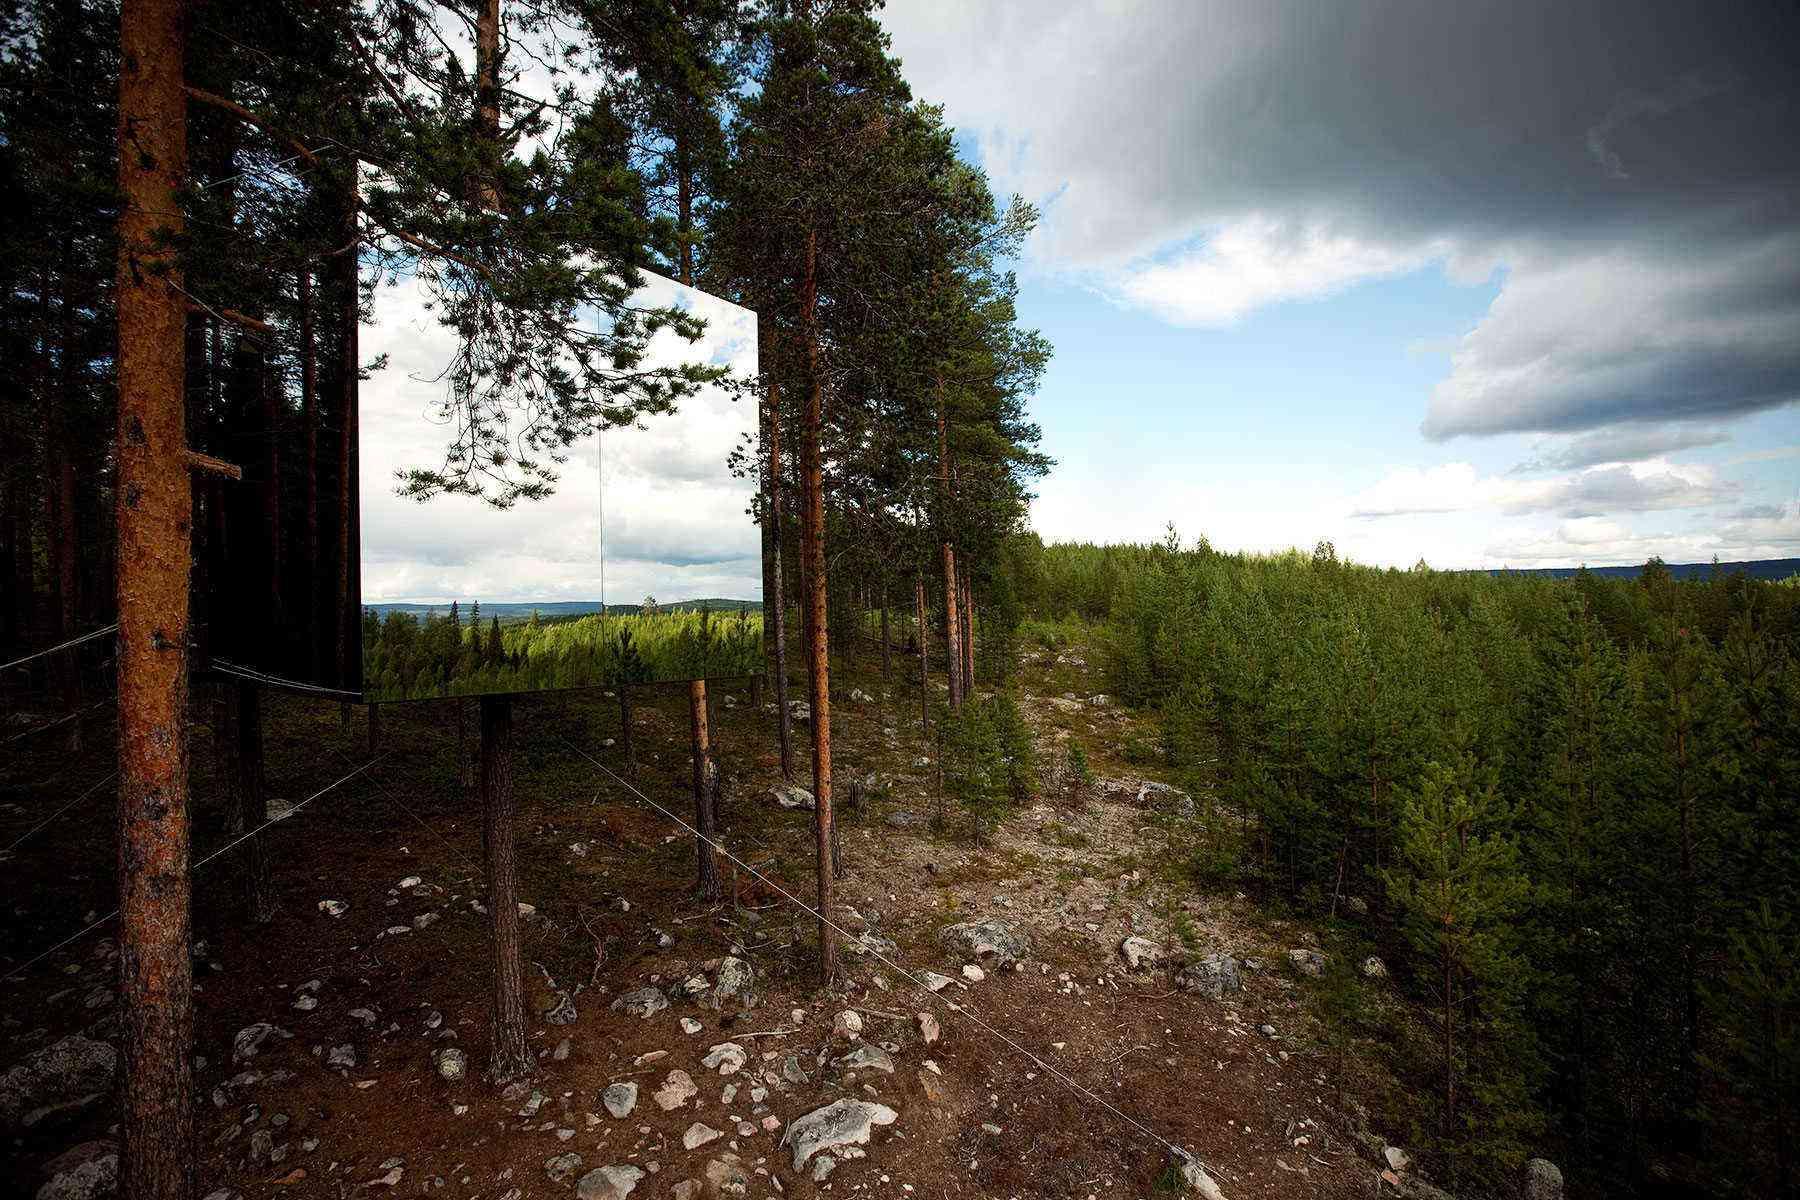 Unusual-Treehouses-Mirrorcube-2